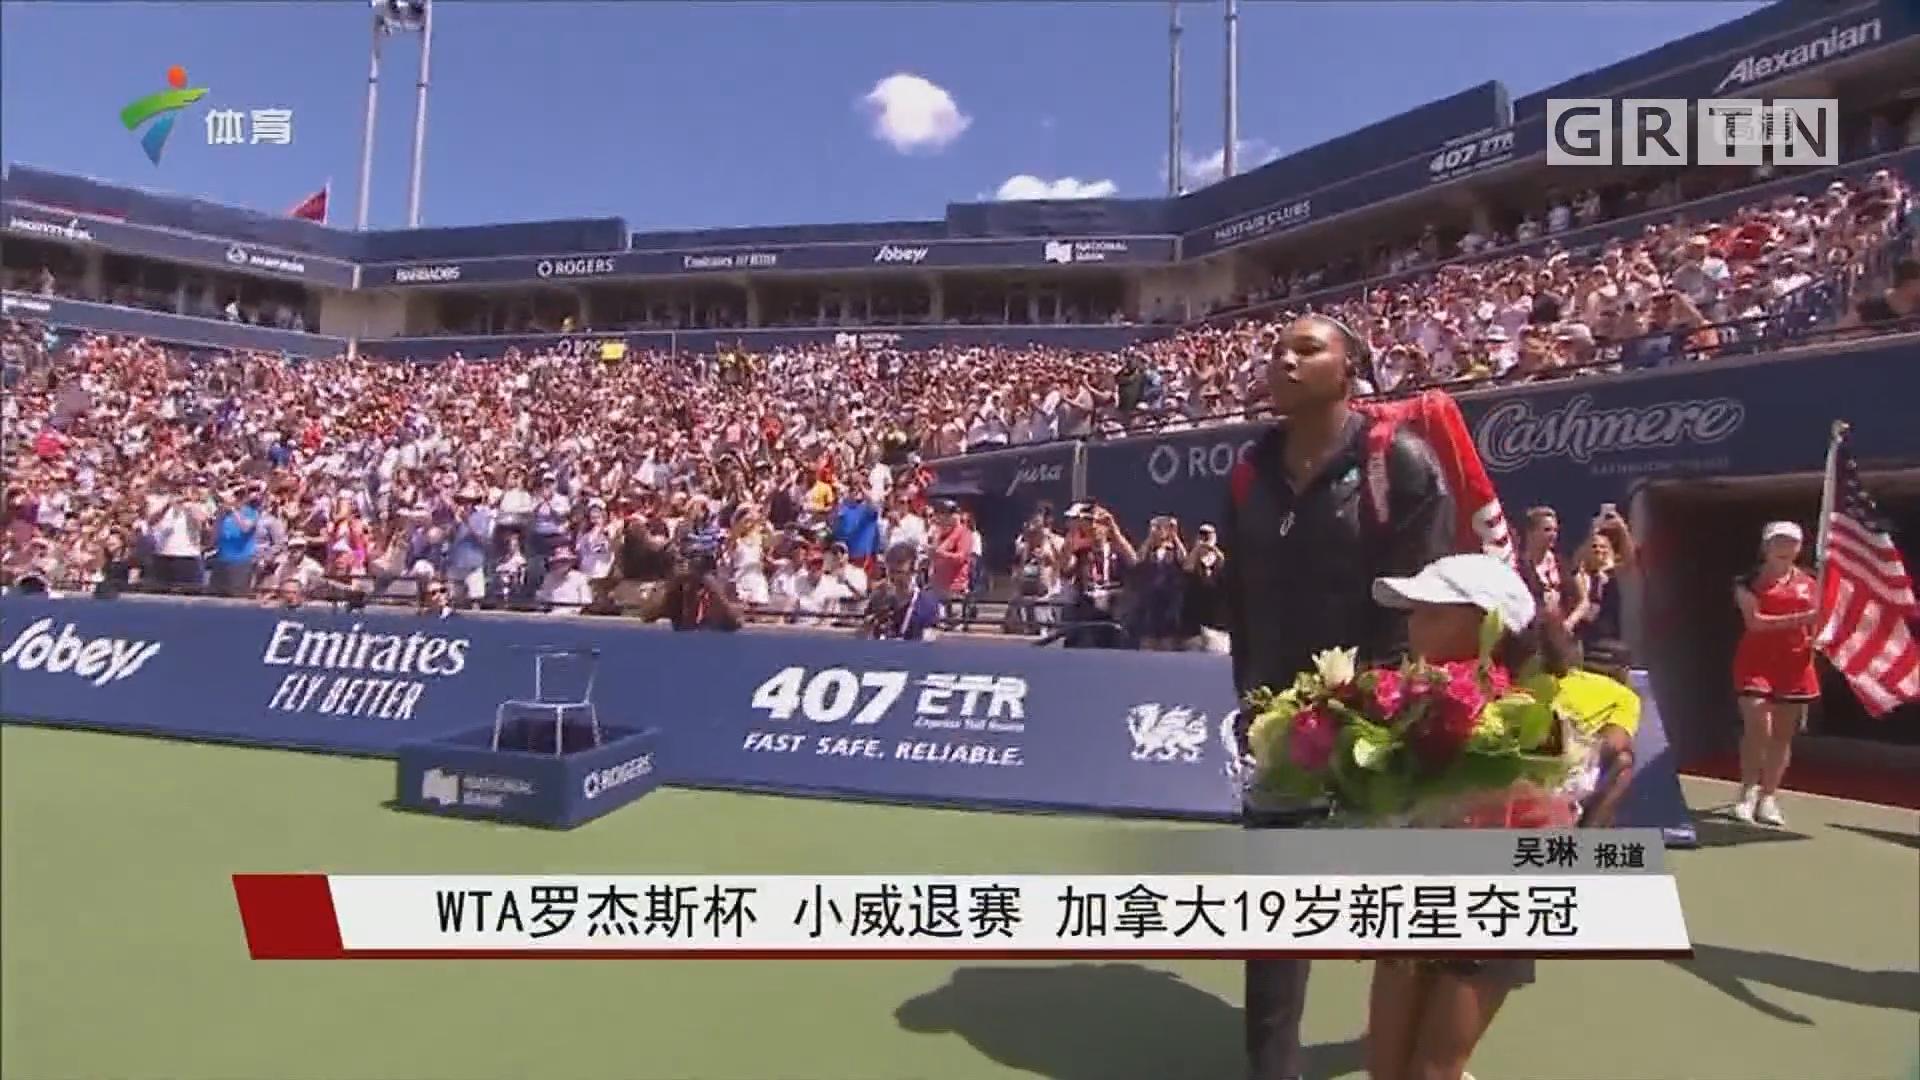 WTA罗杰斯杯 小威退赛 加拿大19岁新星夺冠